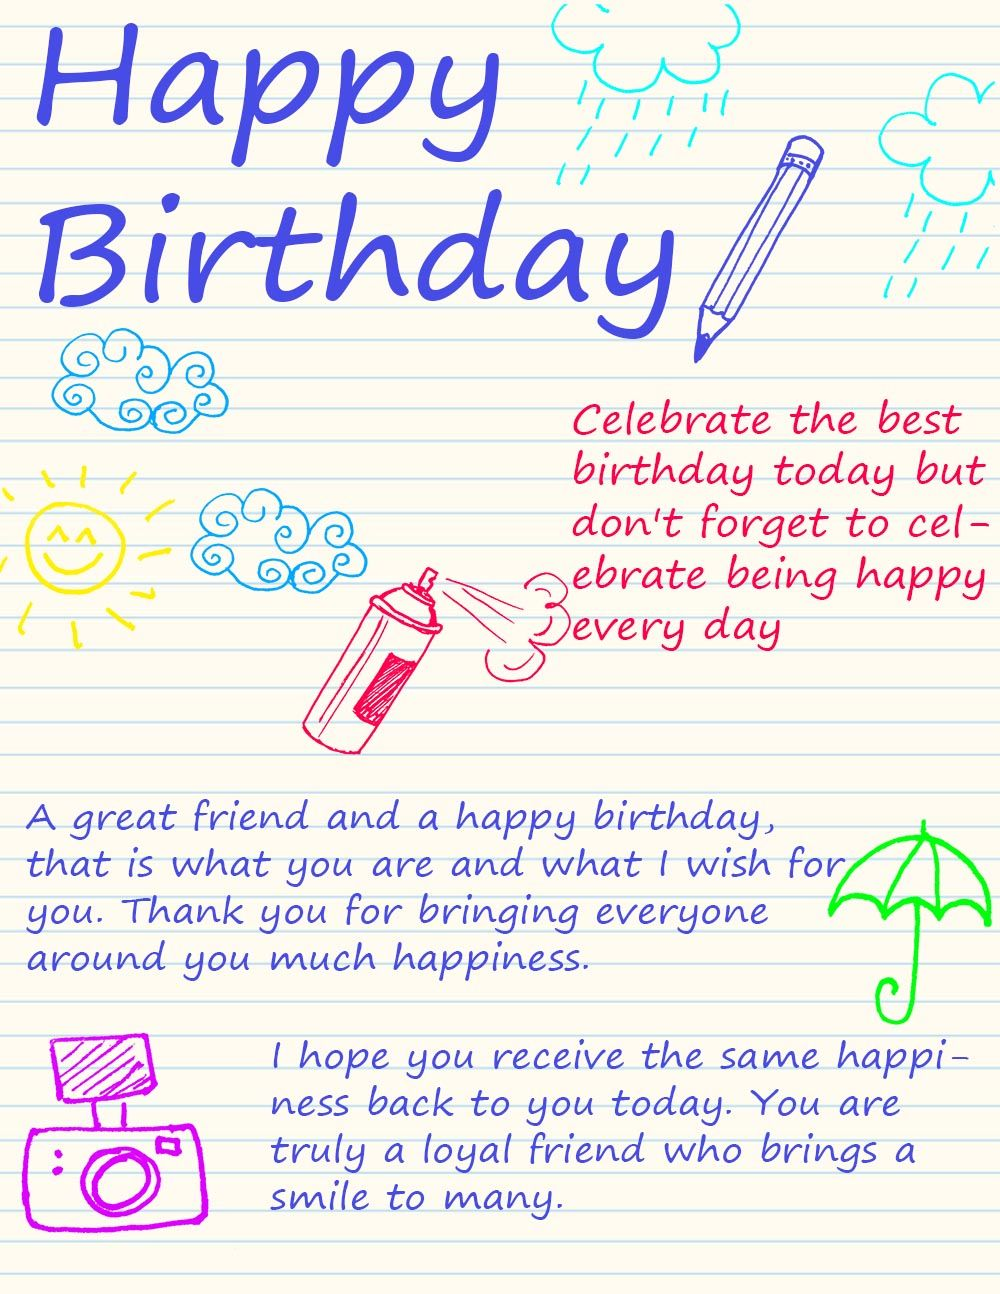 Happy birthday ecard happy birthday pinterest happy birthday happy birthday ecard kristyandbryce Choice Image